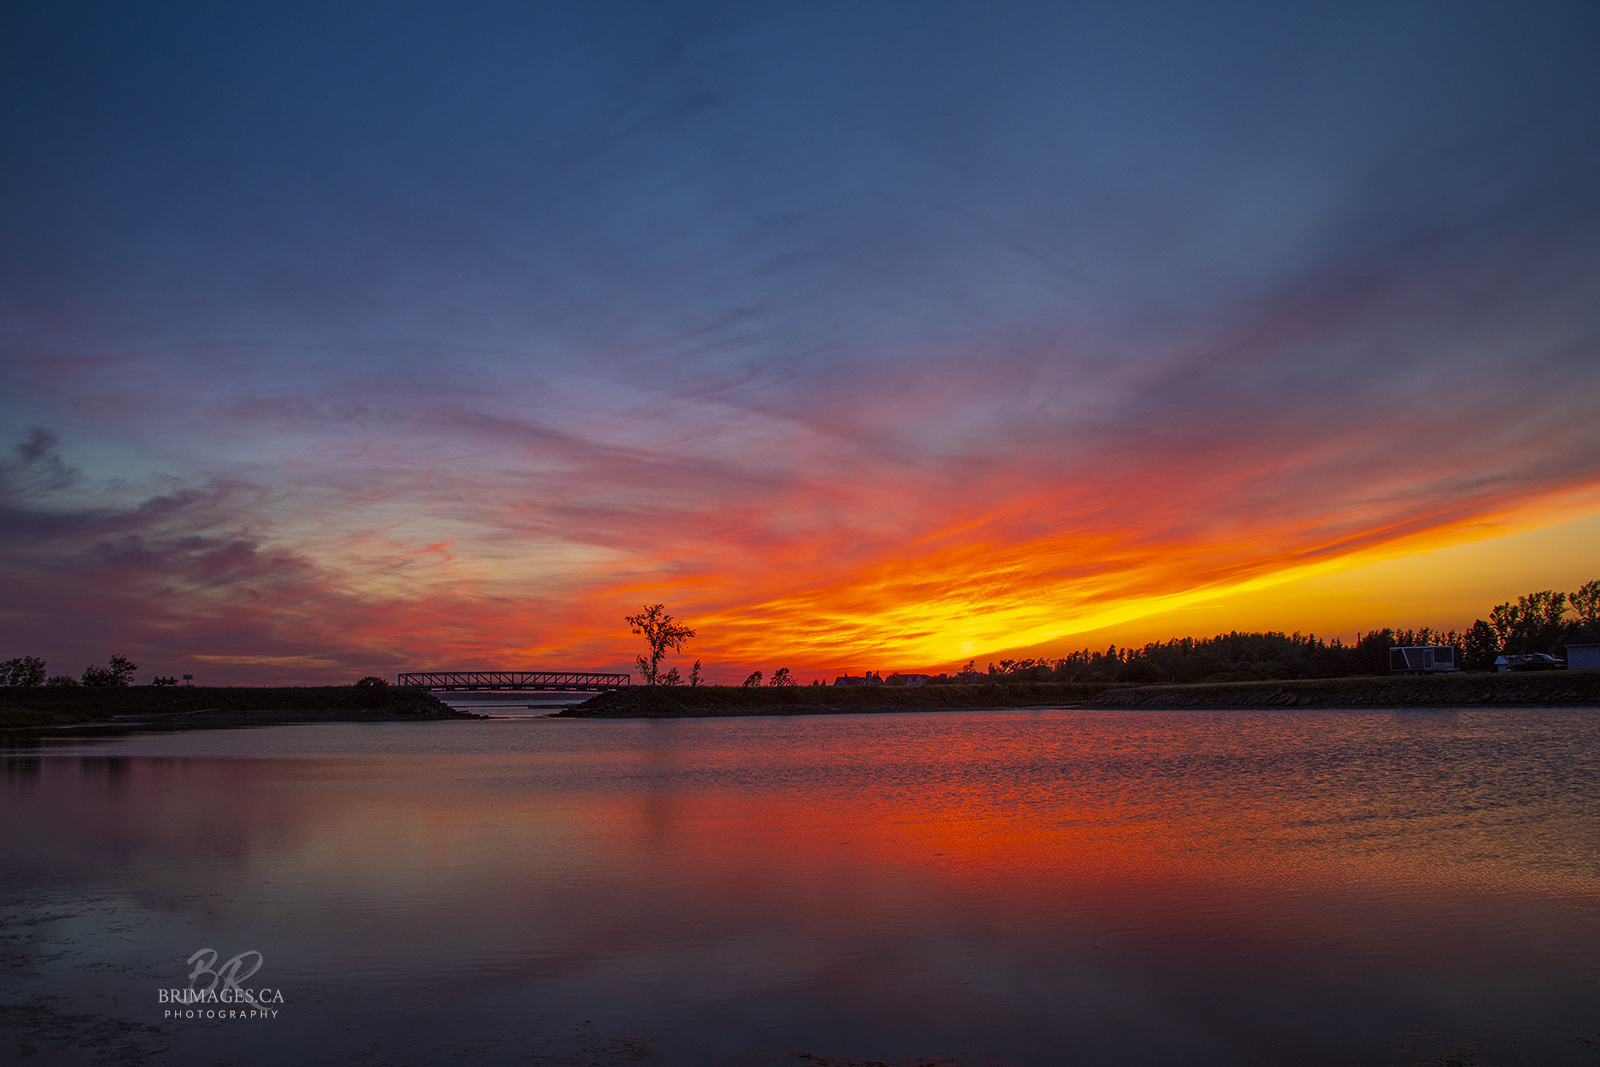 sunset-pointe-du-chene-new-brunswick-canada (3)-BRimages.ca